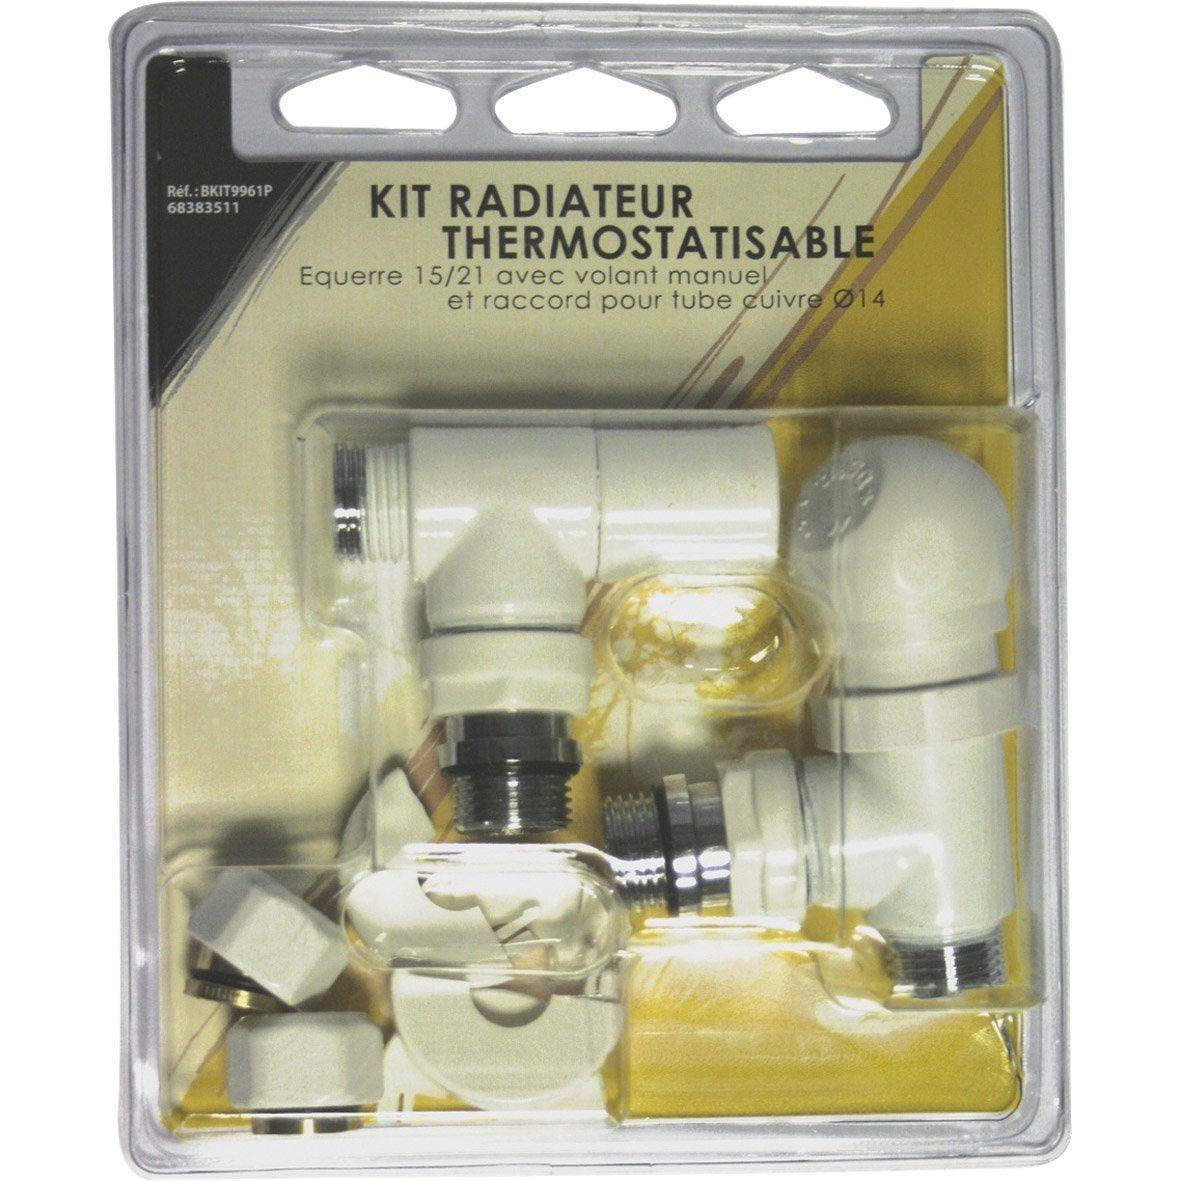 Kit Robinet Thermostatique Equerre 15 23 Male Femelle Laiton Blanc Ecopro Robinet Thermostatique Thermostatique Et Robinet